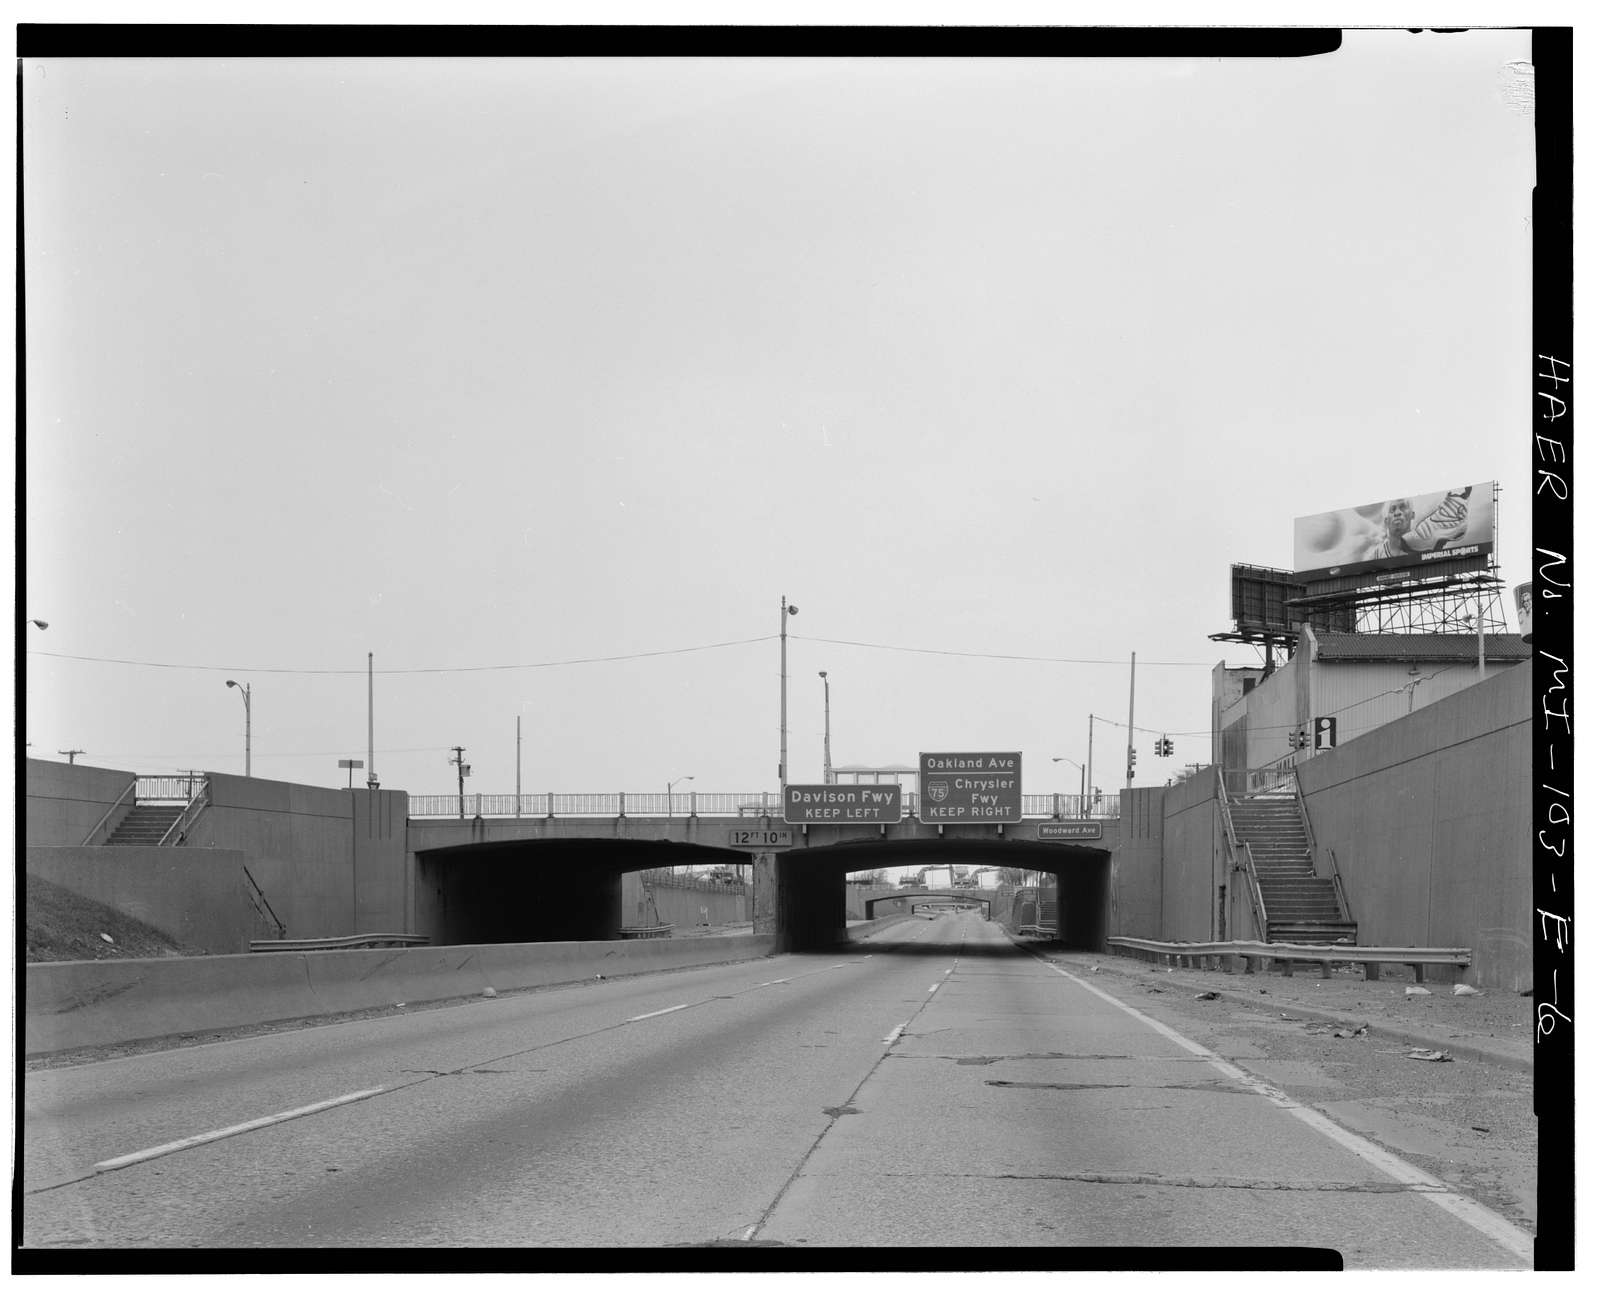 Davison Freeway, Woodward Avenue Bridge, Spanning Davison Freeway, Highland Park, Wayne County, MI